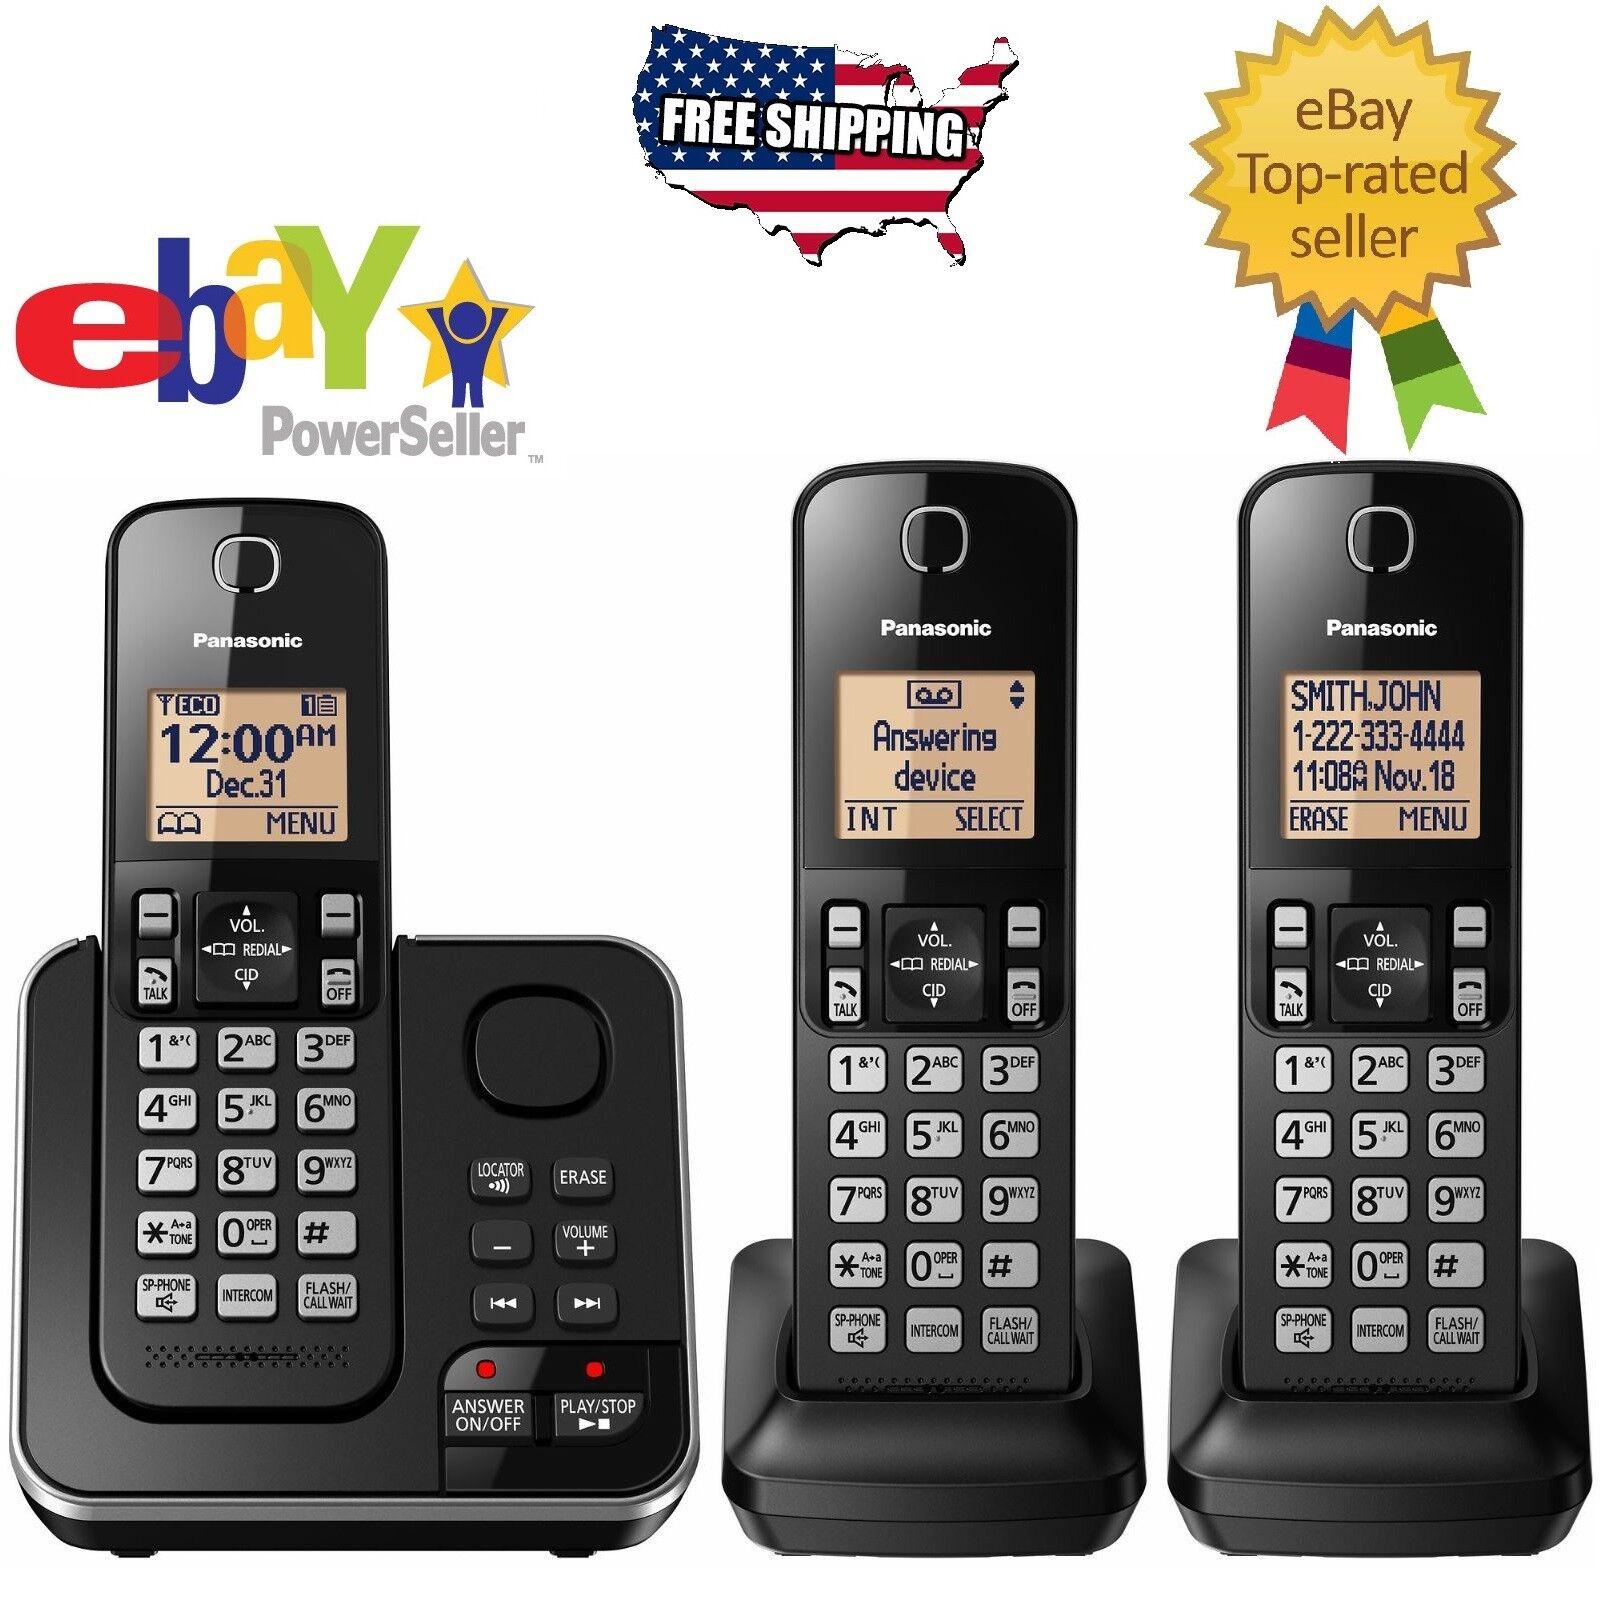 Panasonic DECT 6.0 3-Handset Digital Cordless Phone Home Telephone